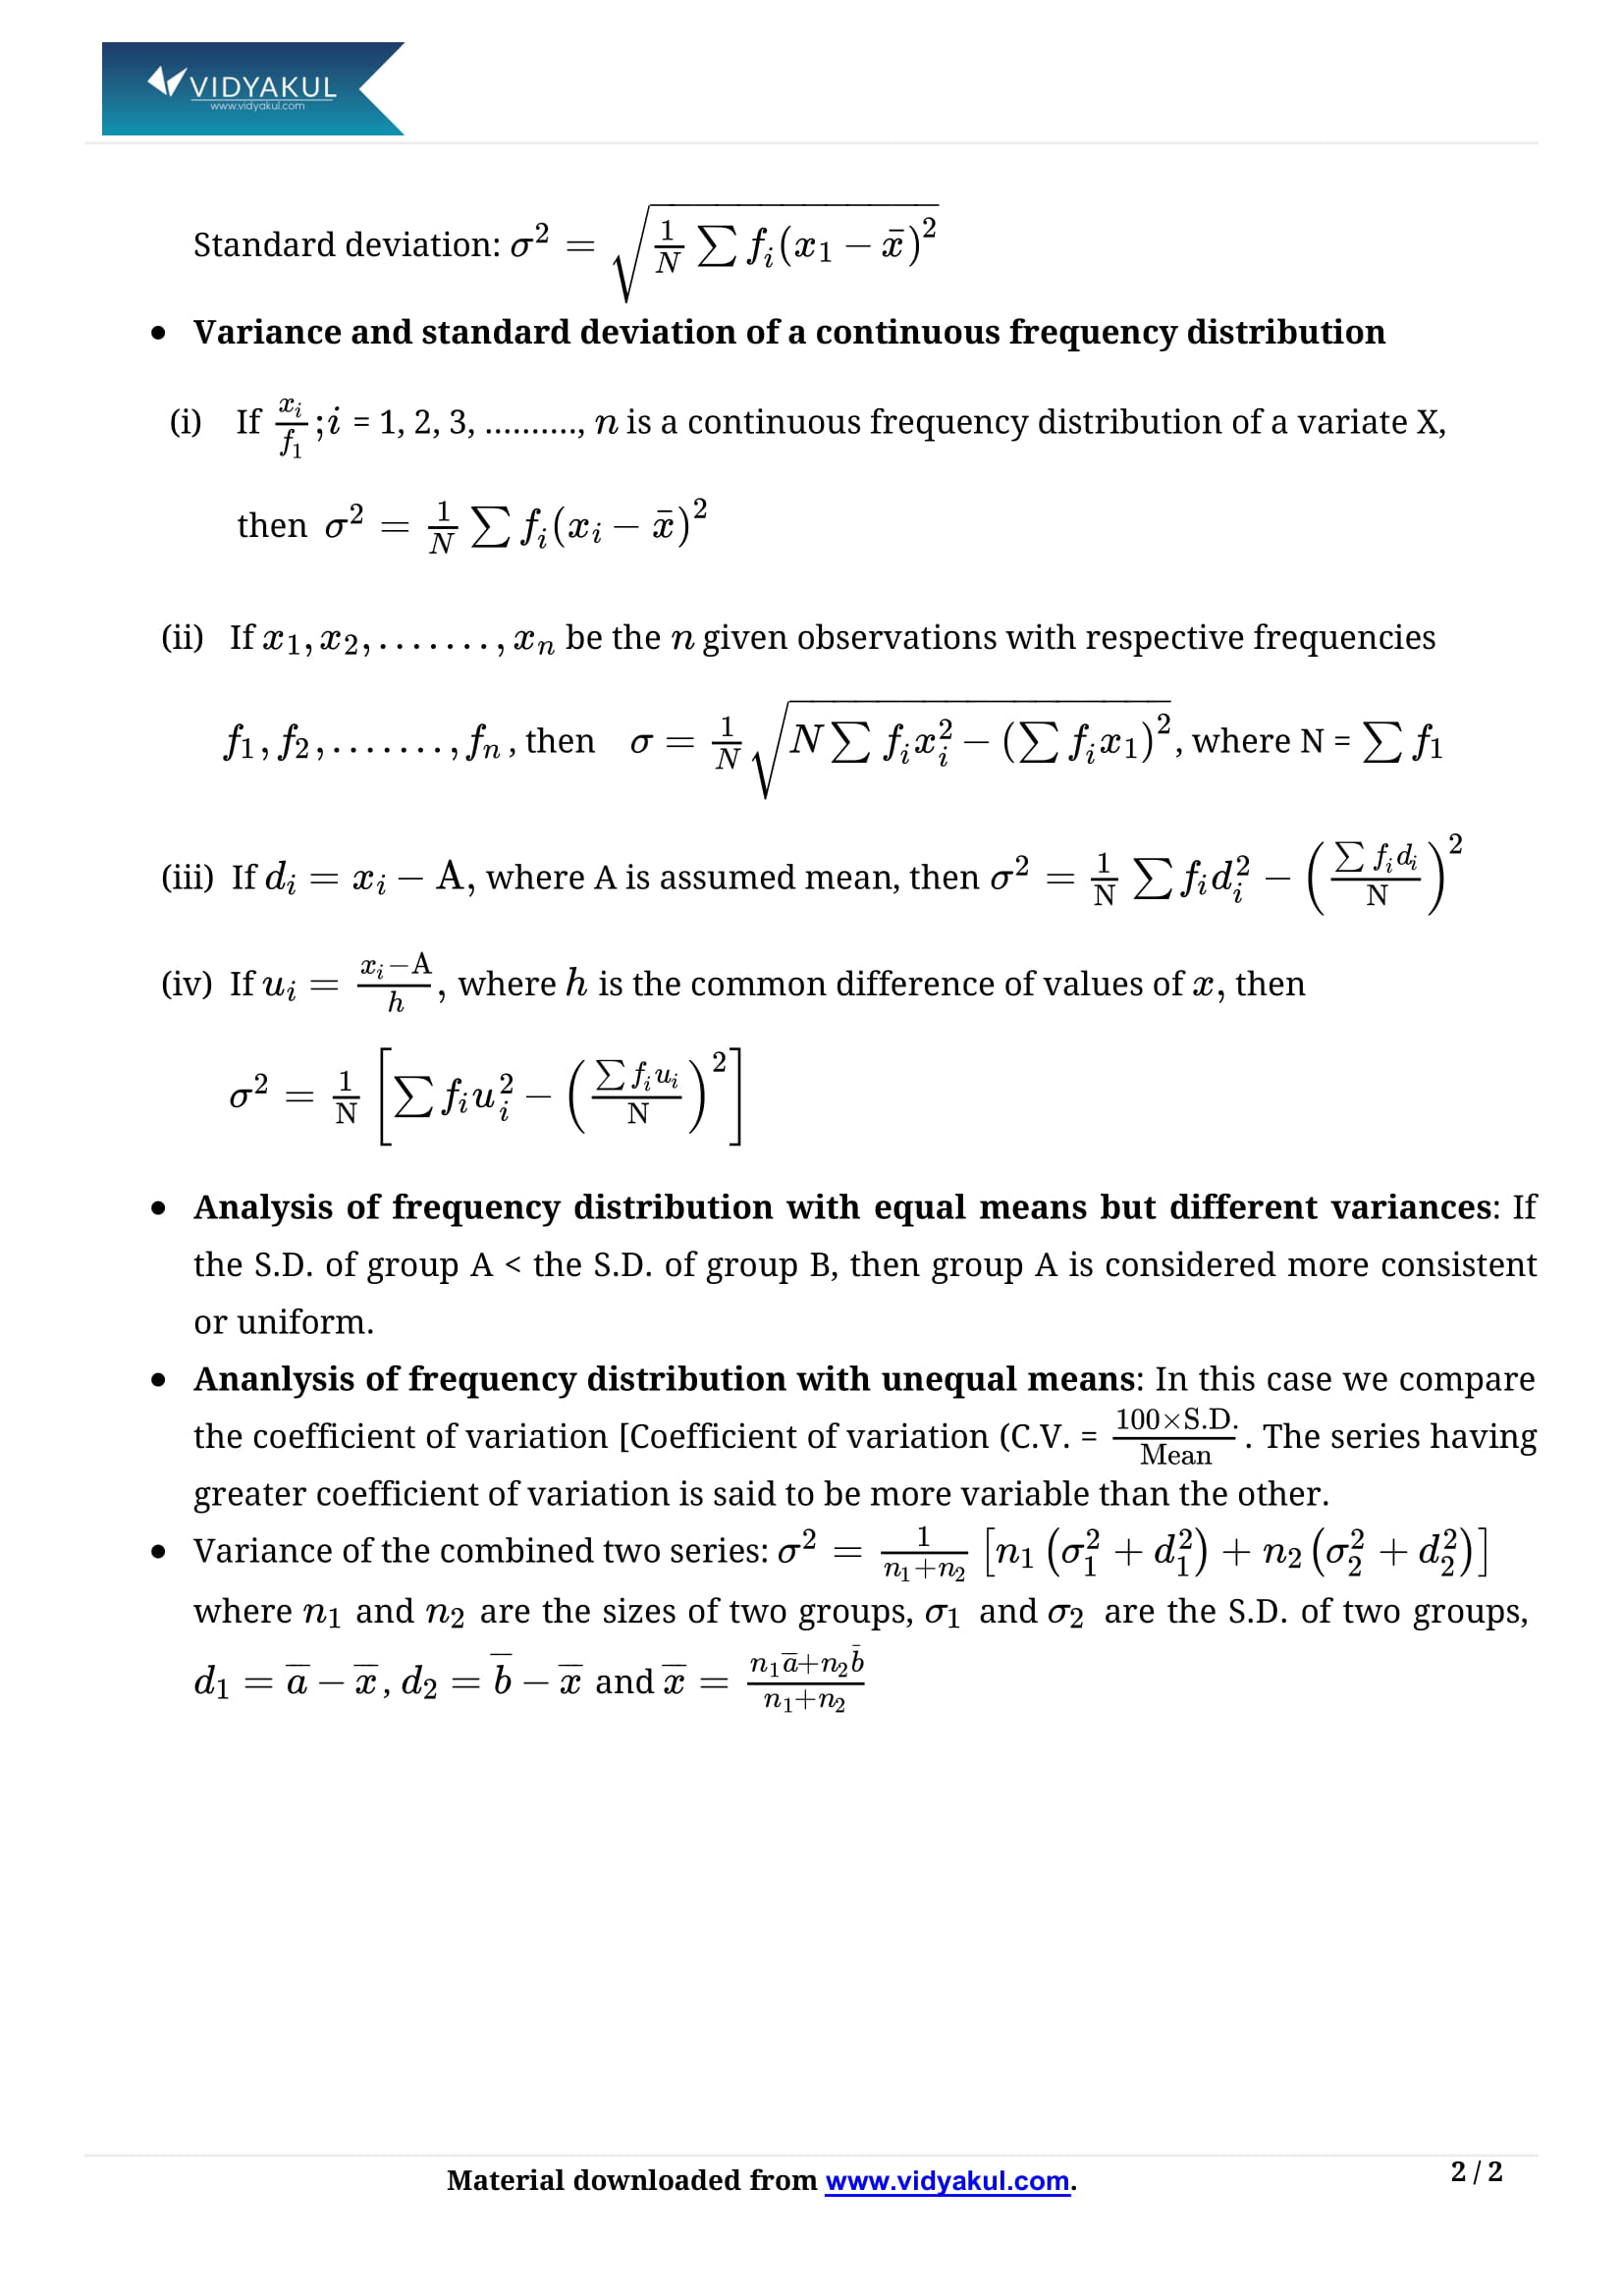 Statistics Class 11 Formulas & Notes | Vidyakul